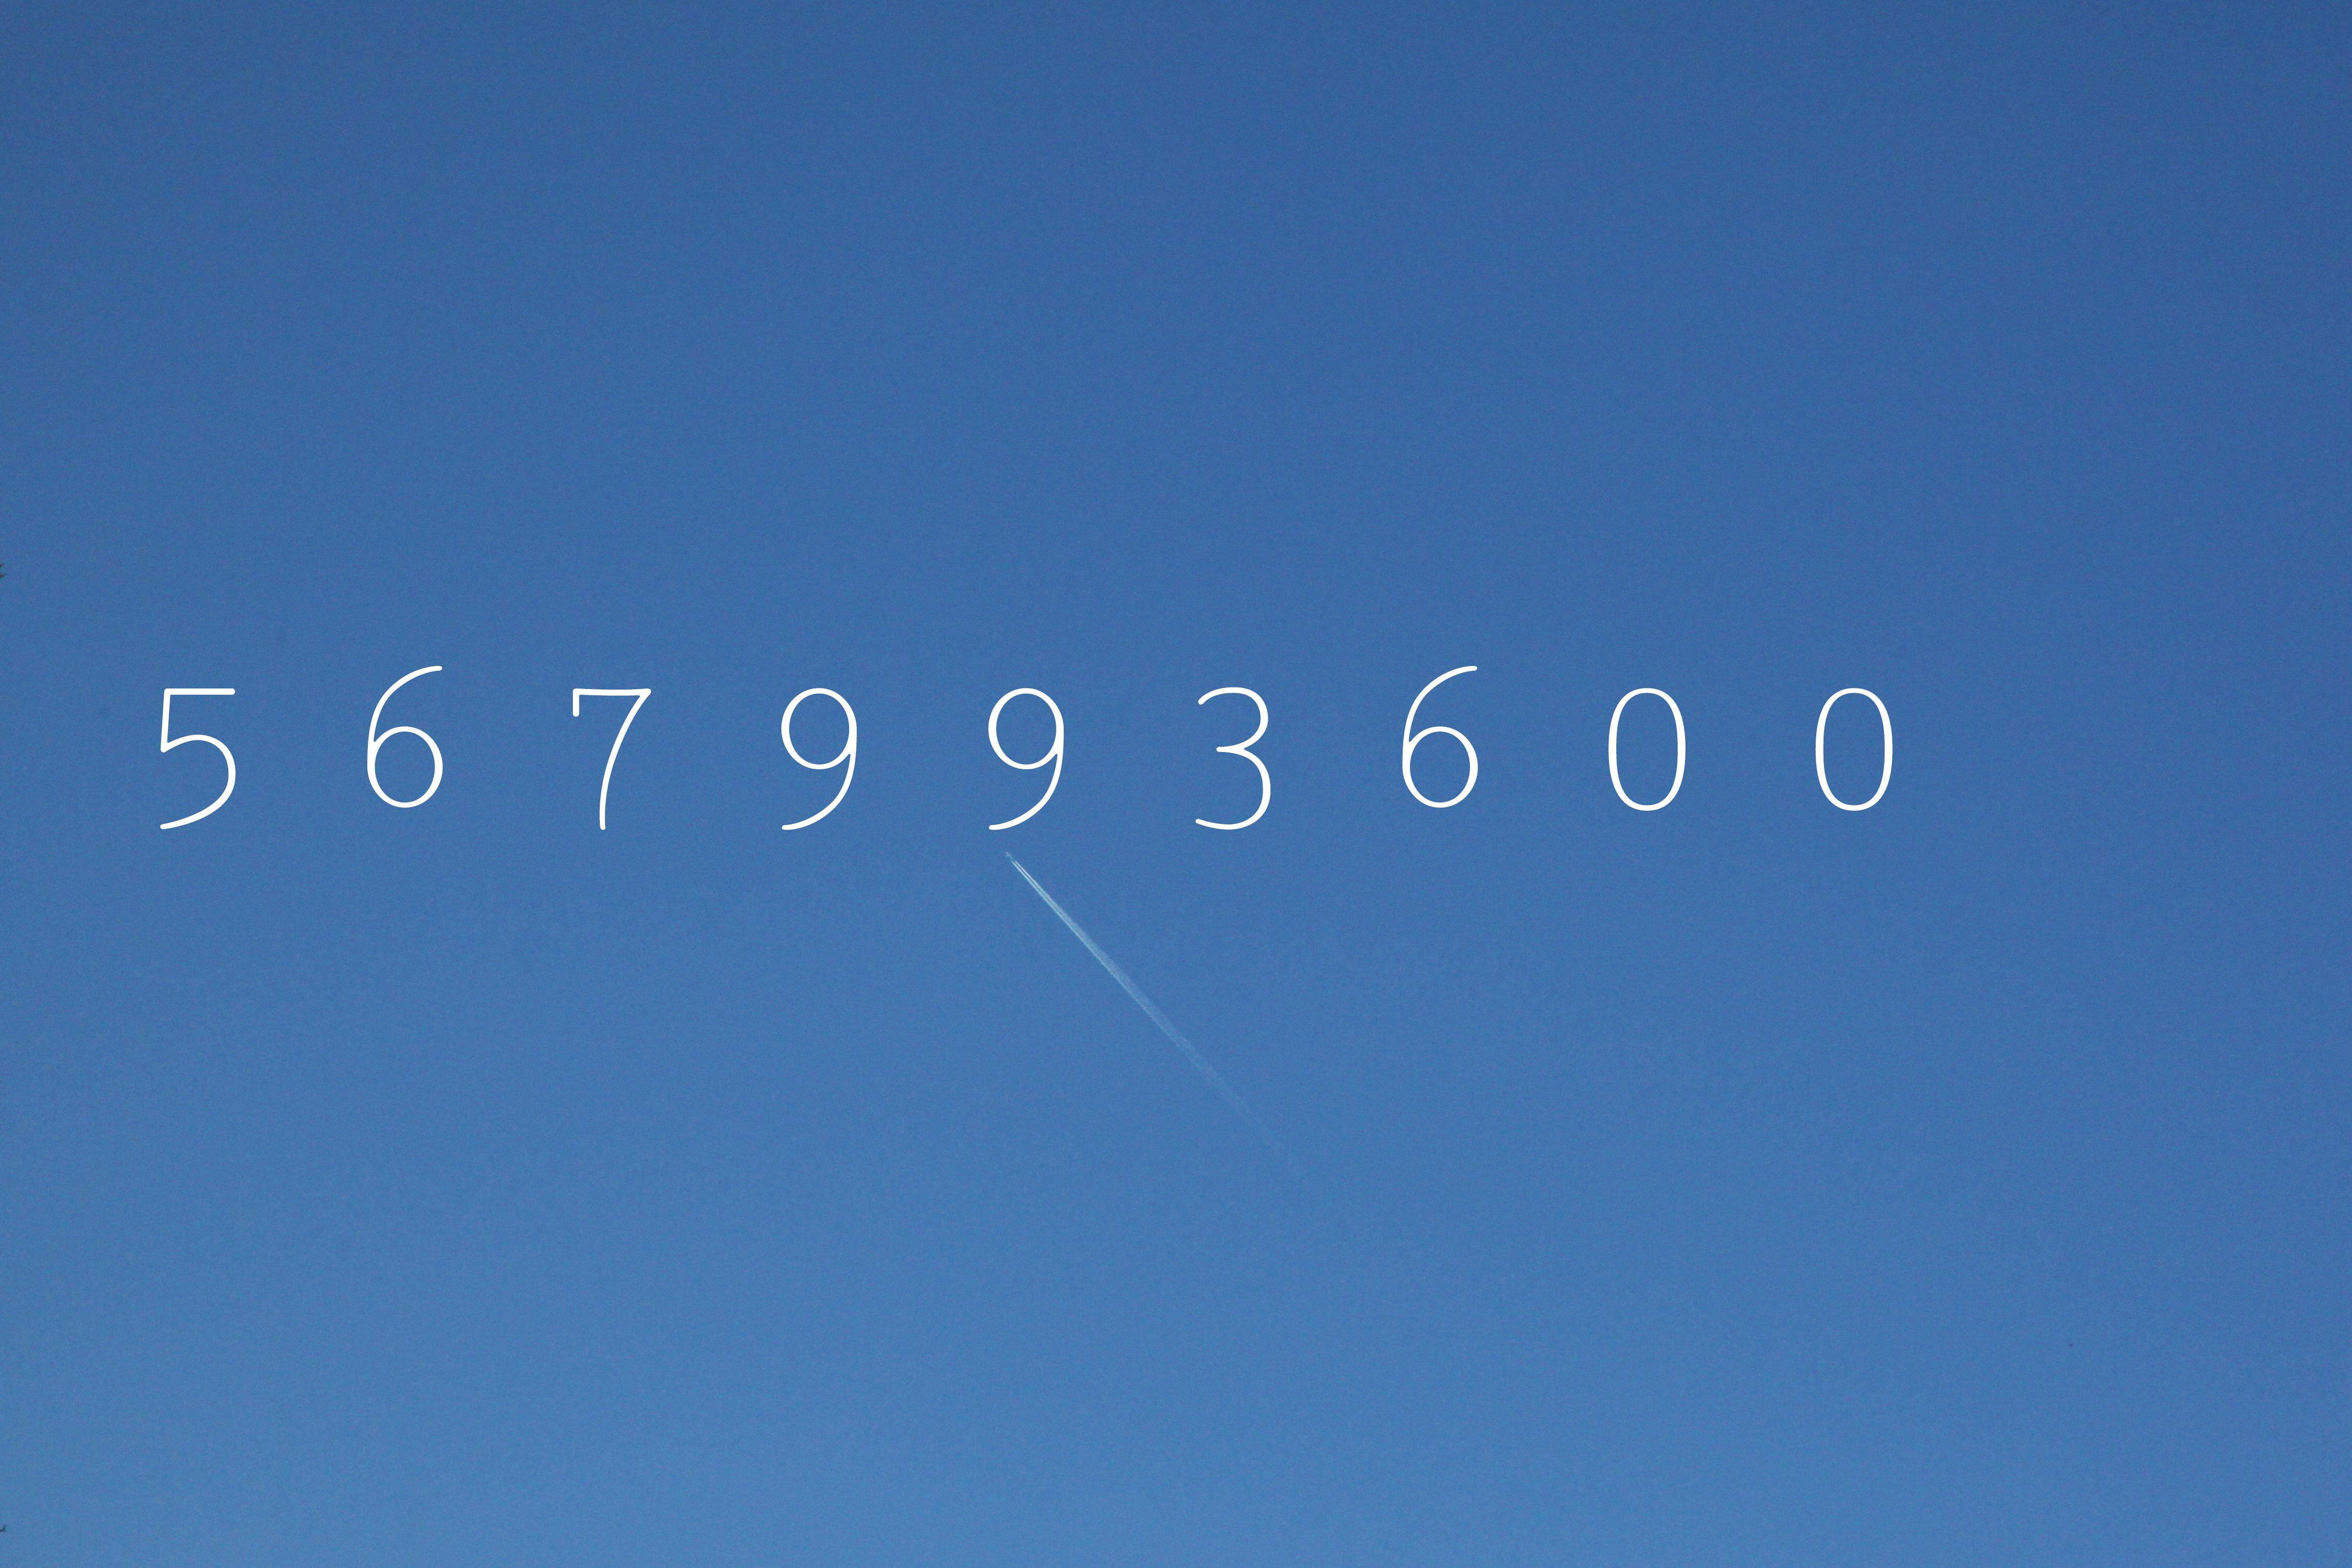 Leap Second, 31 December 1987 - 23:59:60